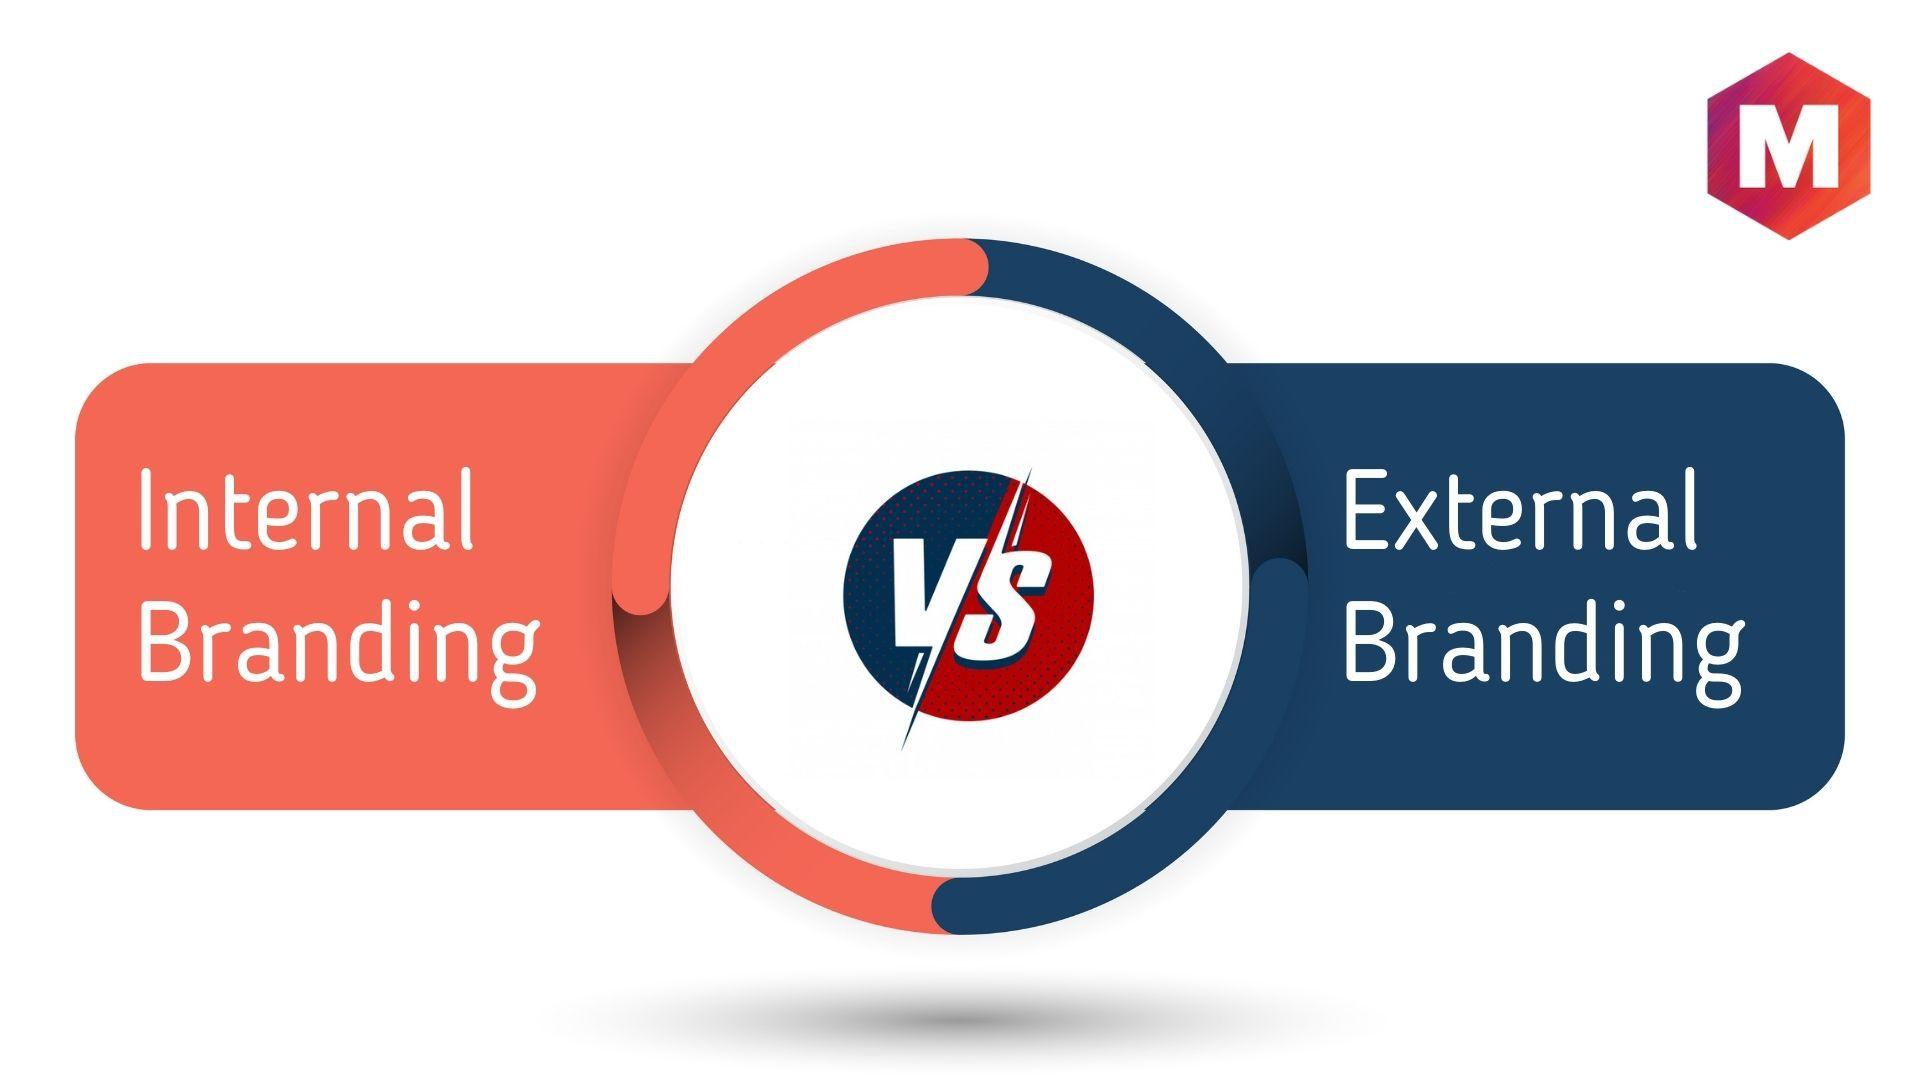 Internal Branding vs External Branding